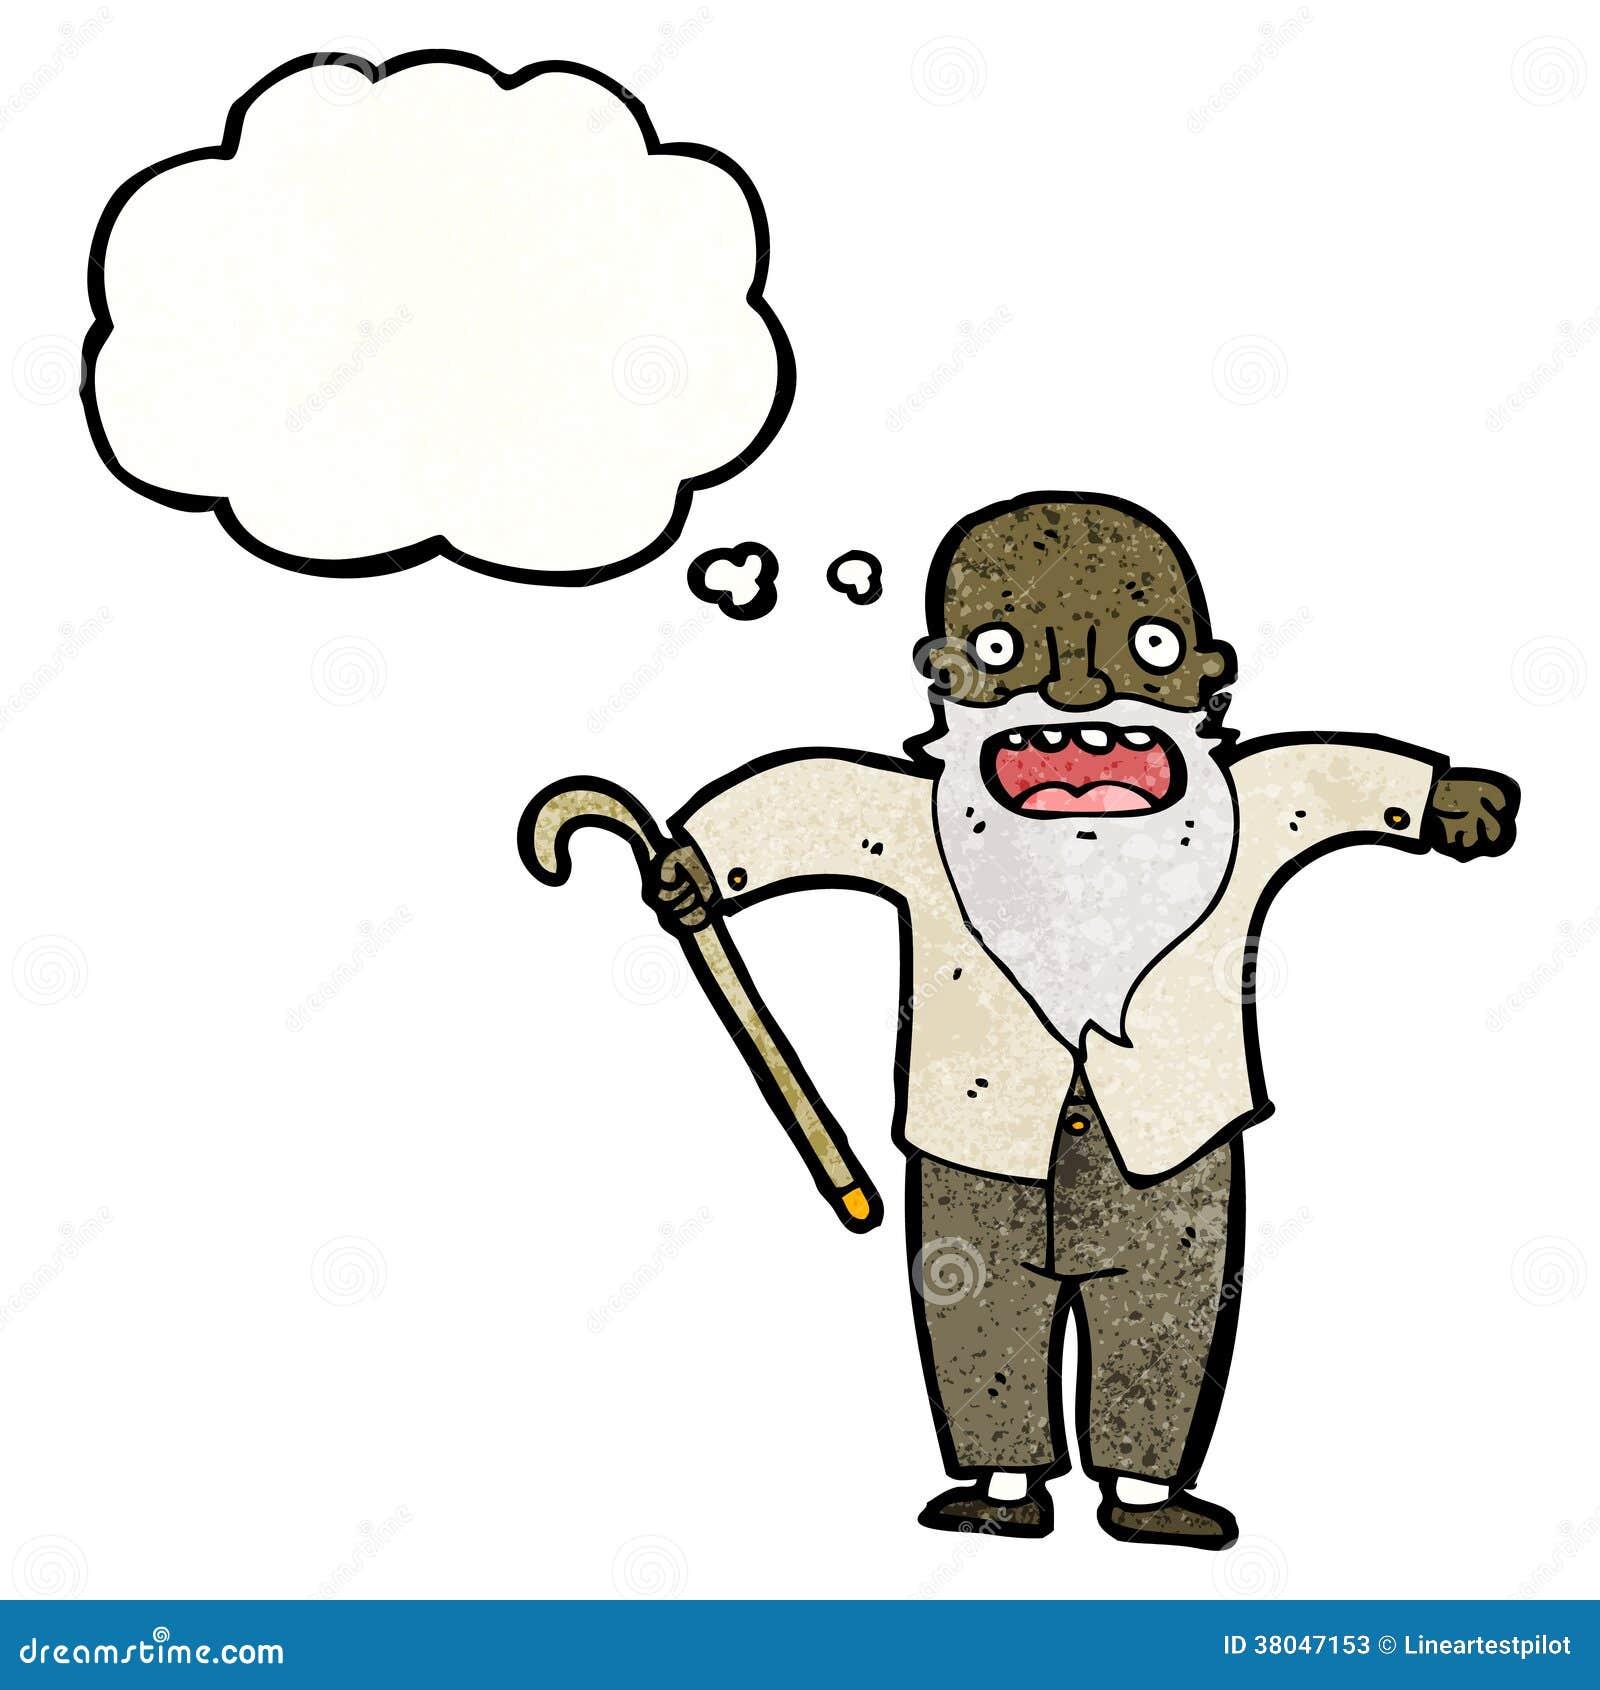 More similar stock images of ` cartoon old man with walking stick ` Old Man Walking Cartoon